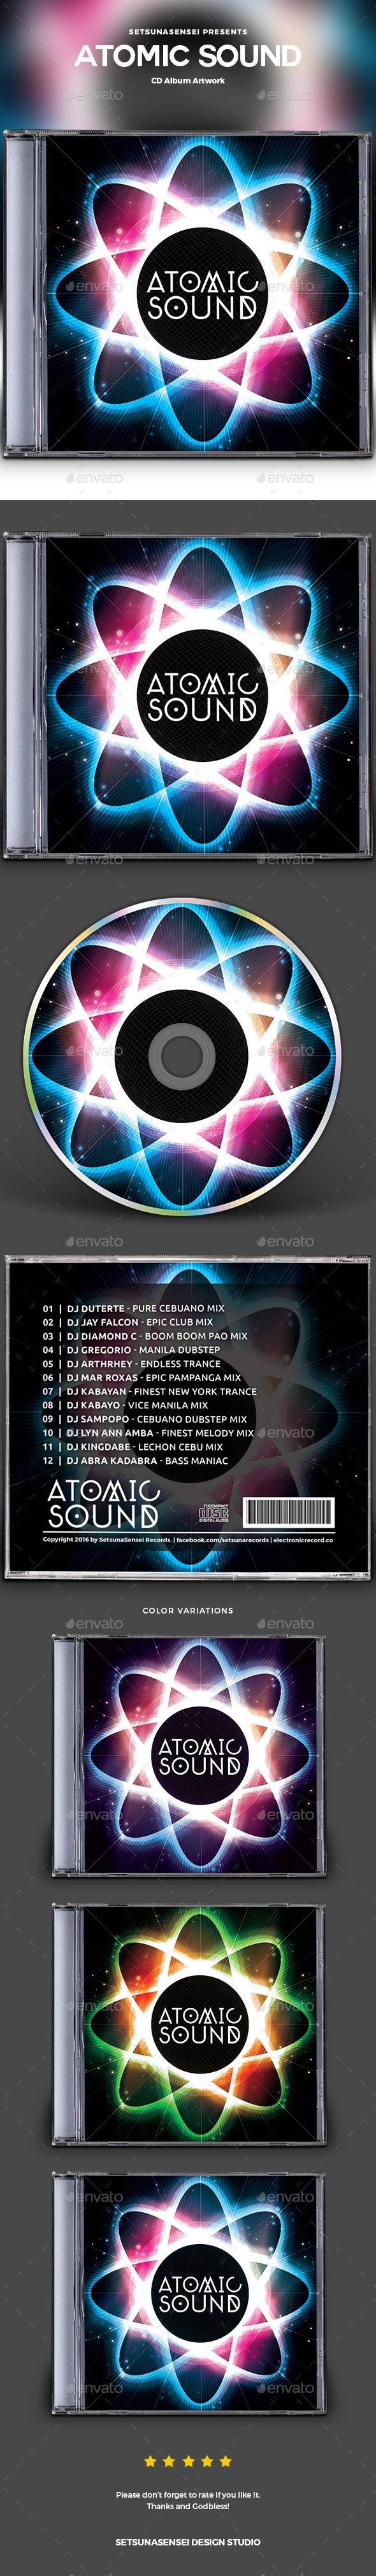 Atomic Sound CD Album Artwork - CD & DVD Artwork Print Templates